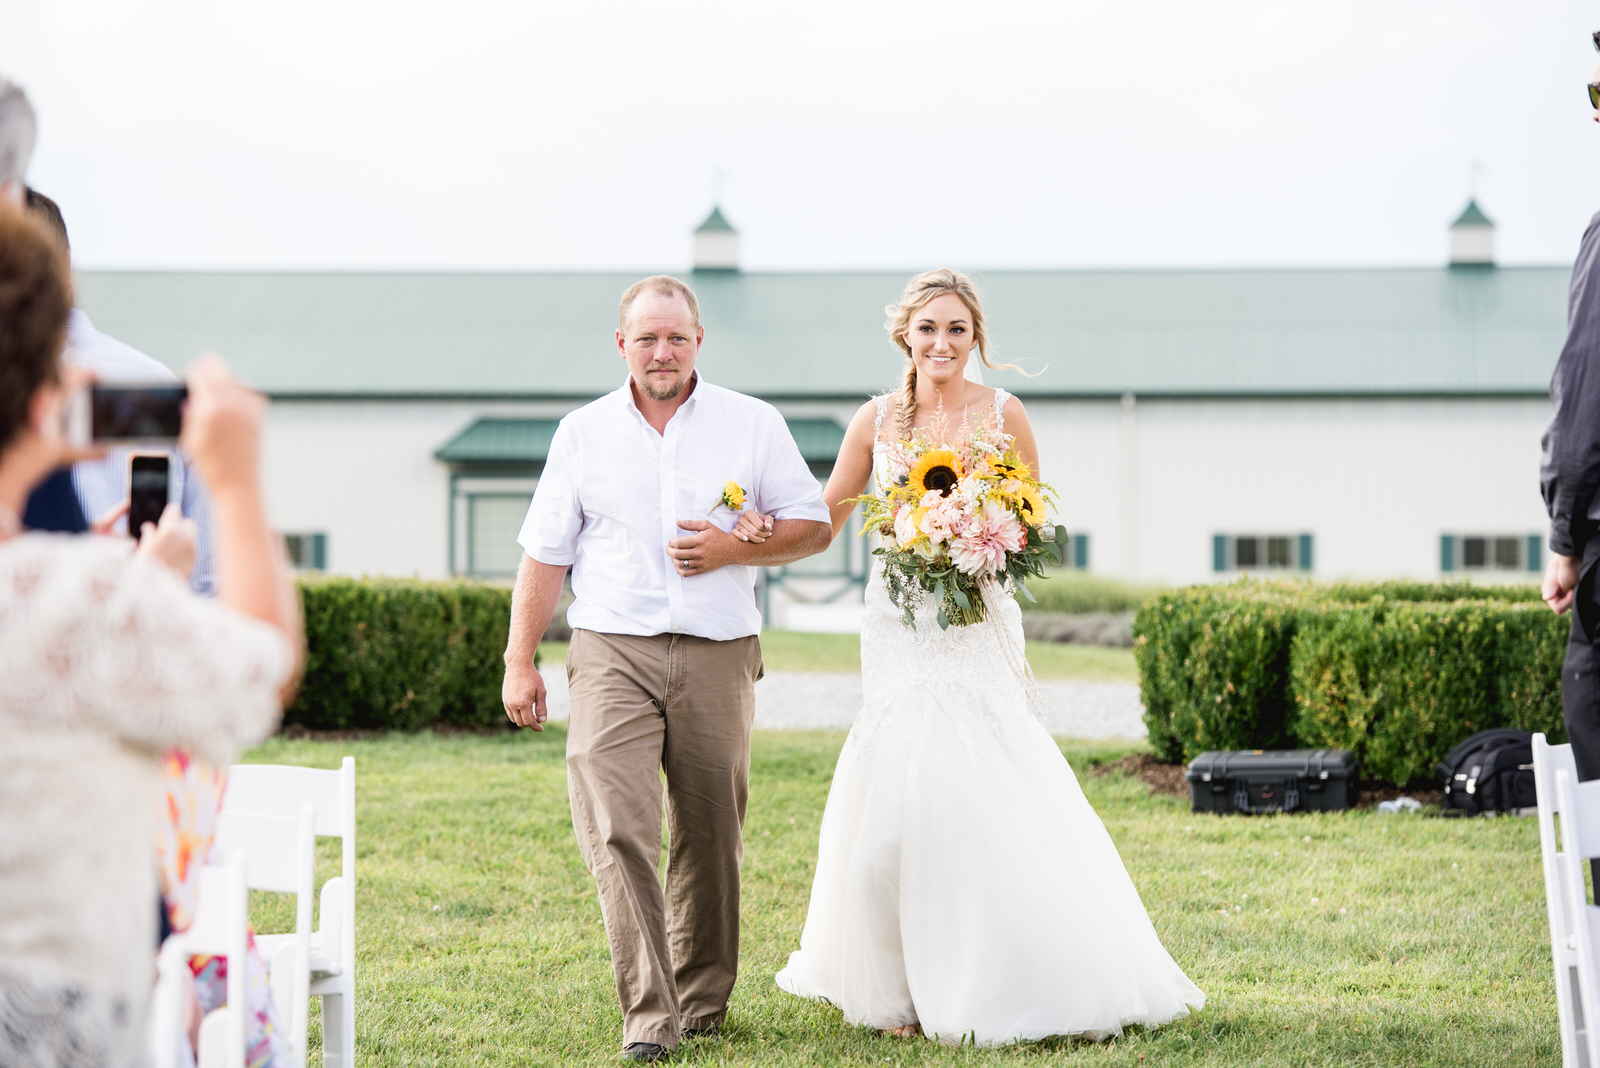 destiny-hill-farm-wedding-photos-pittsburgh-wedding-photographers-46.jpg